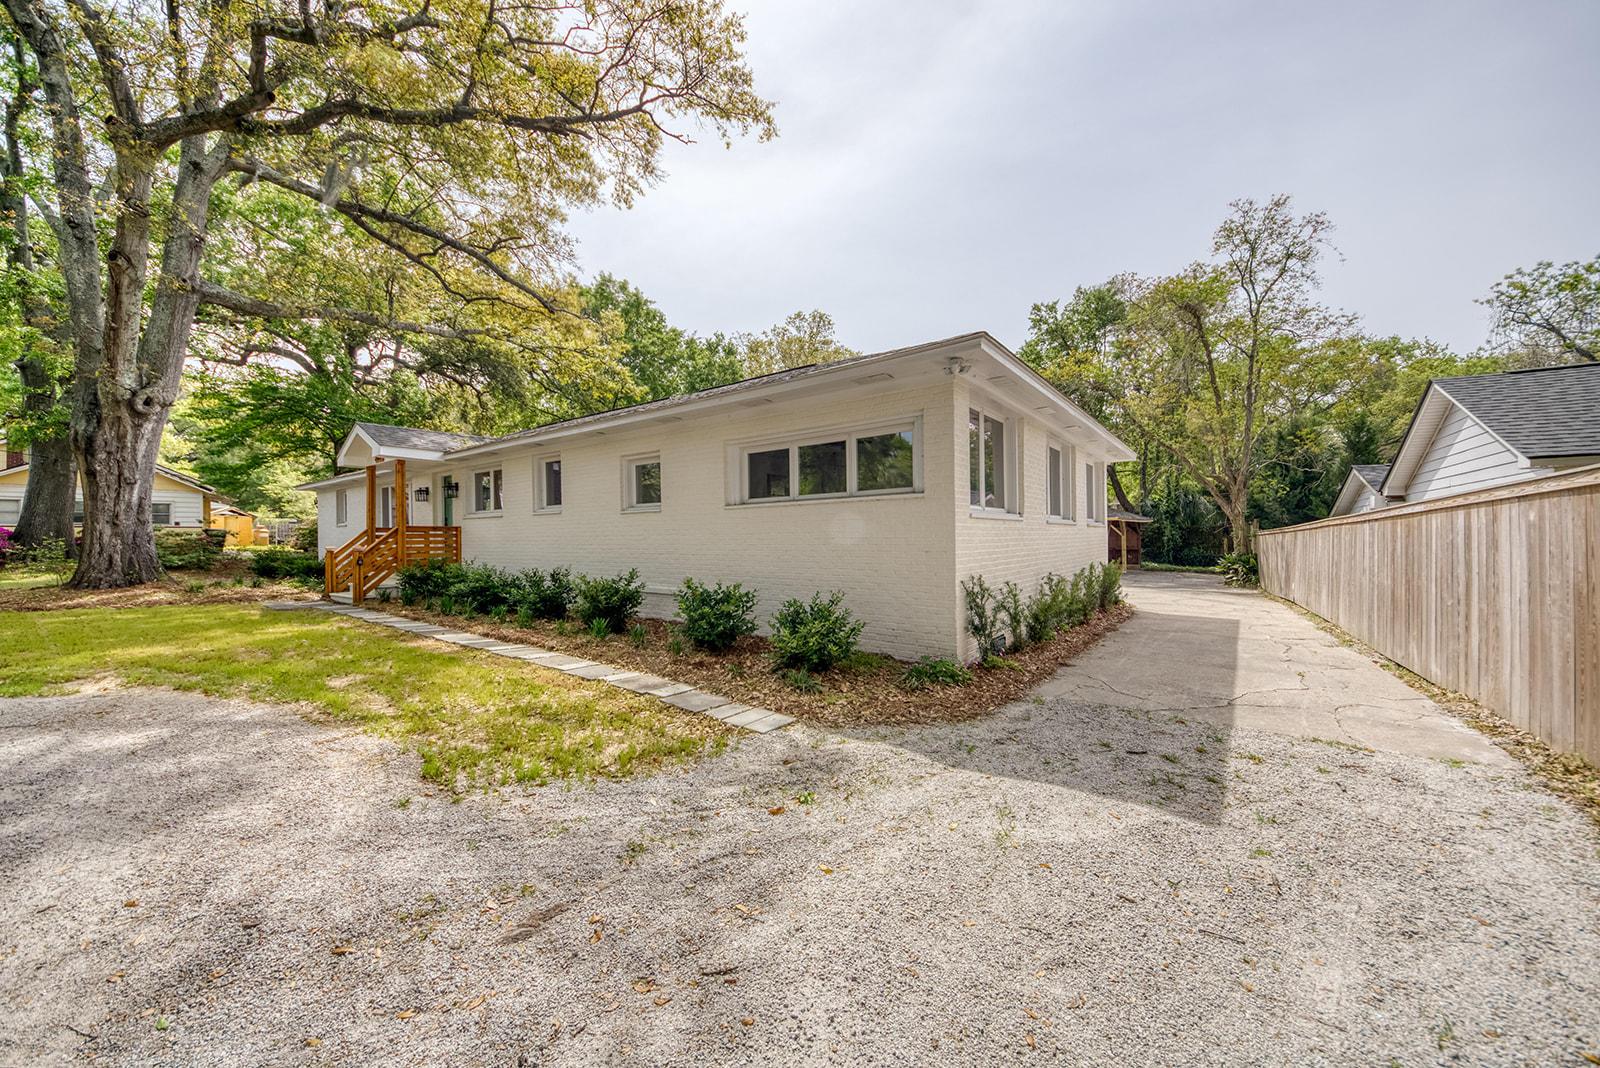 Bay View Acres Homes For Sale - 265 Coleman, Mount Pleasant, SC - 17